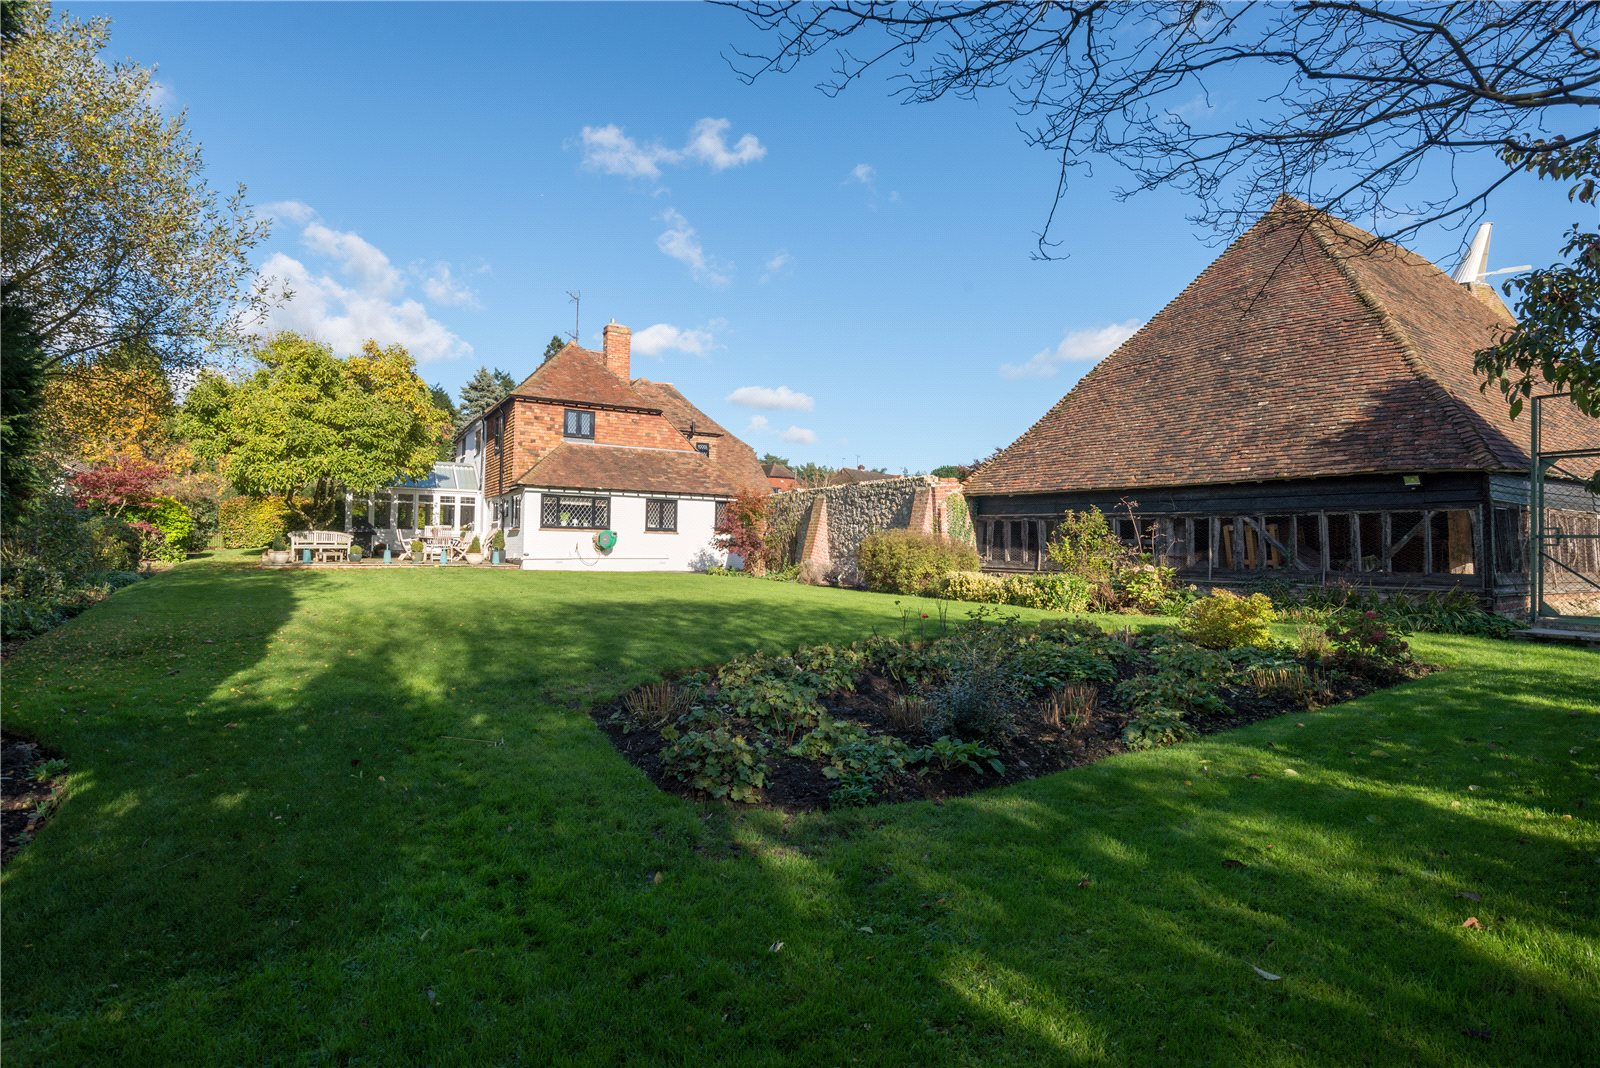 Villa per Vendita alle ore The Street, Willesborough, Ashford, Kent, TN24 Ashford, Inghilterra